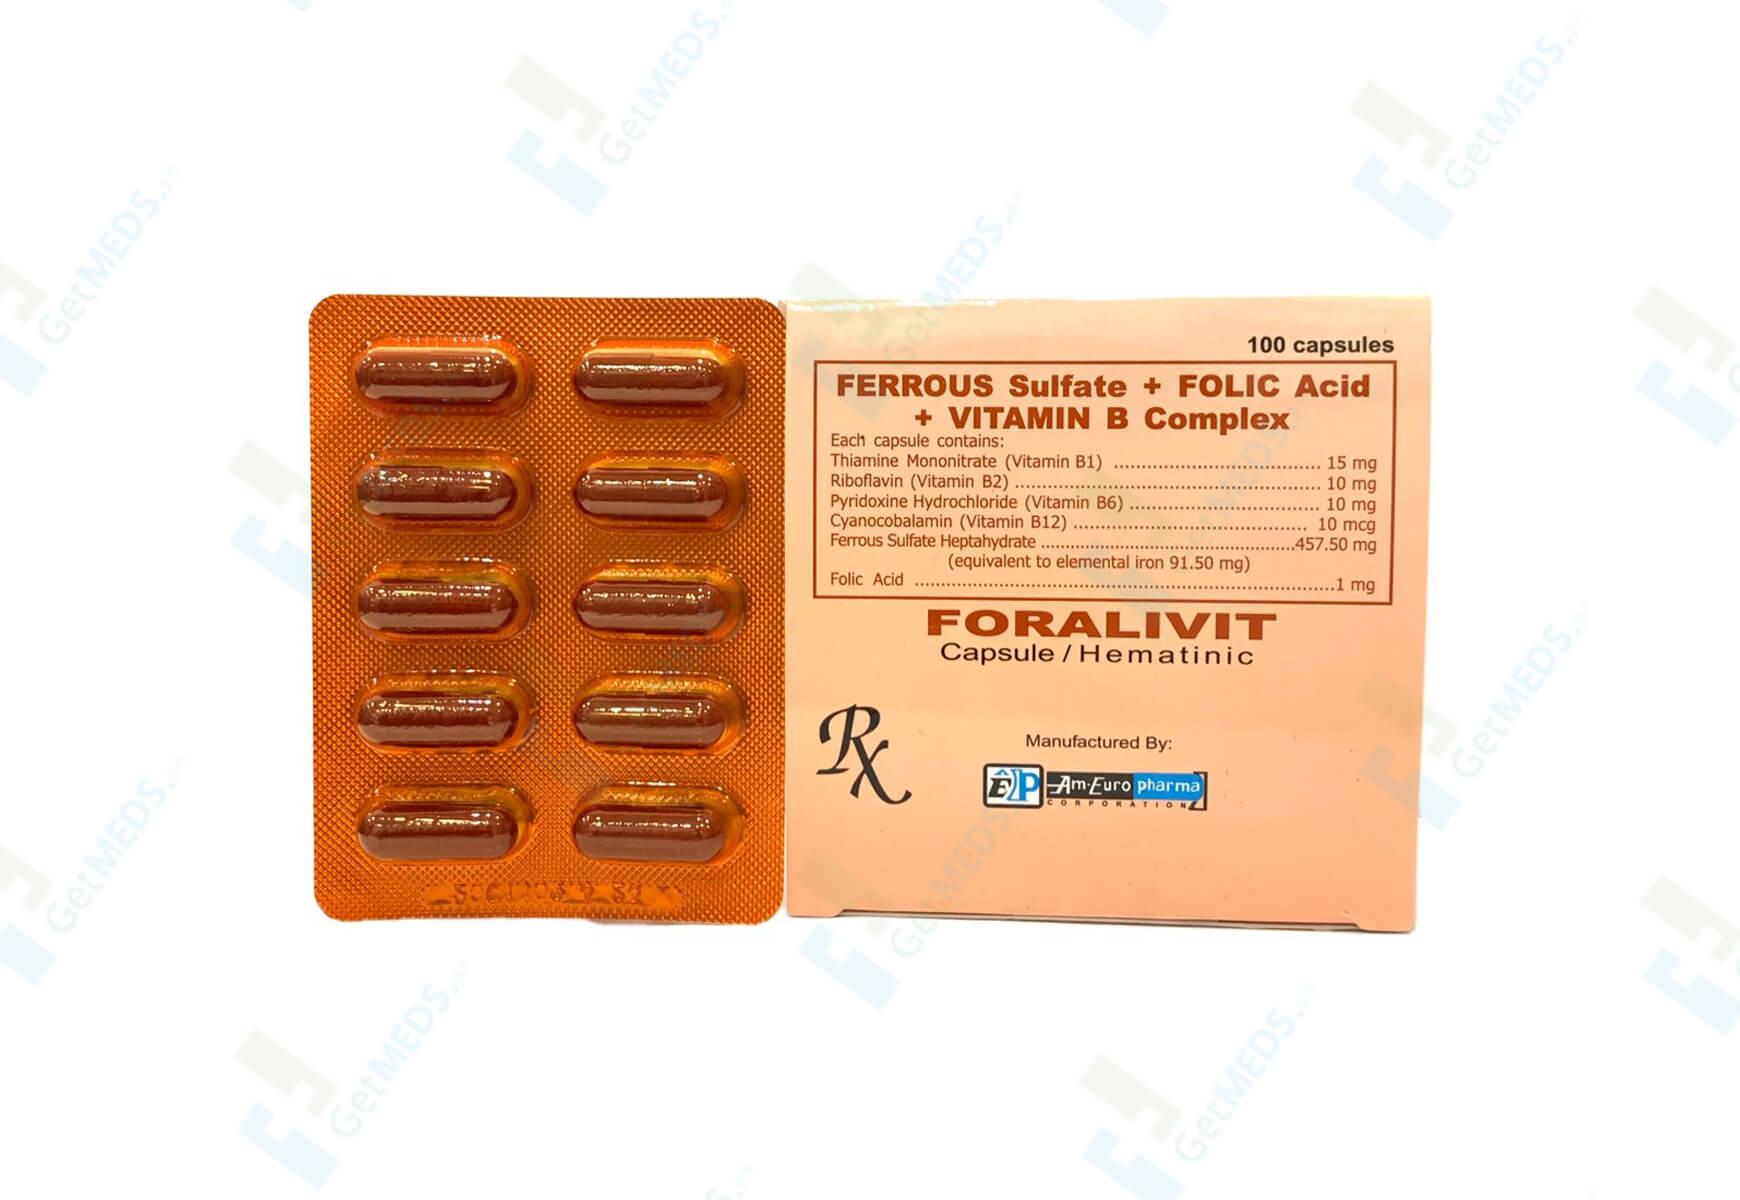 Foralivit